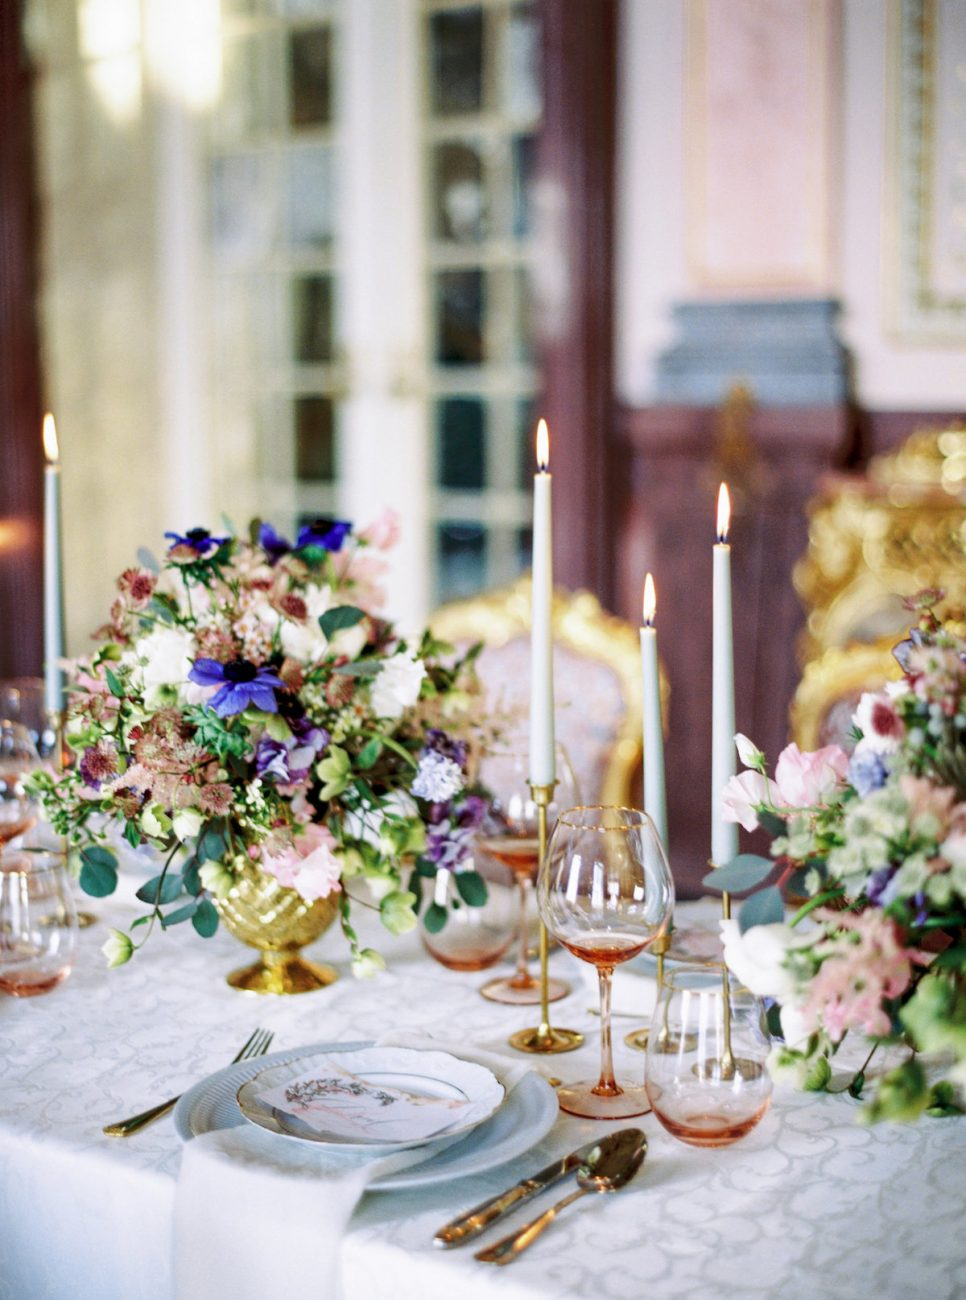 Palace Wedding Inspiration - luxury place names on table setting